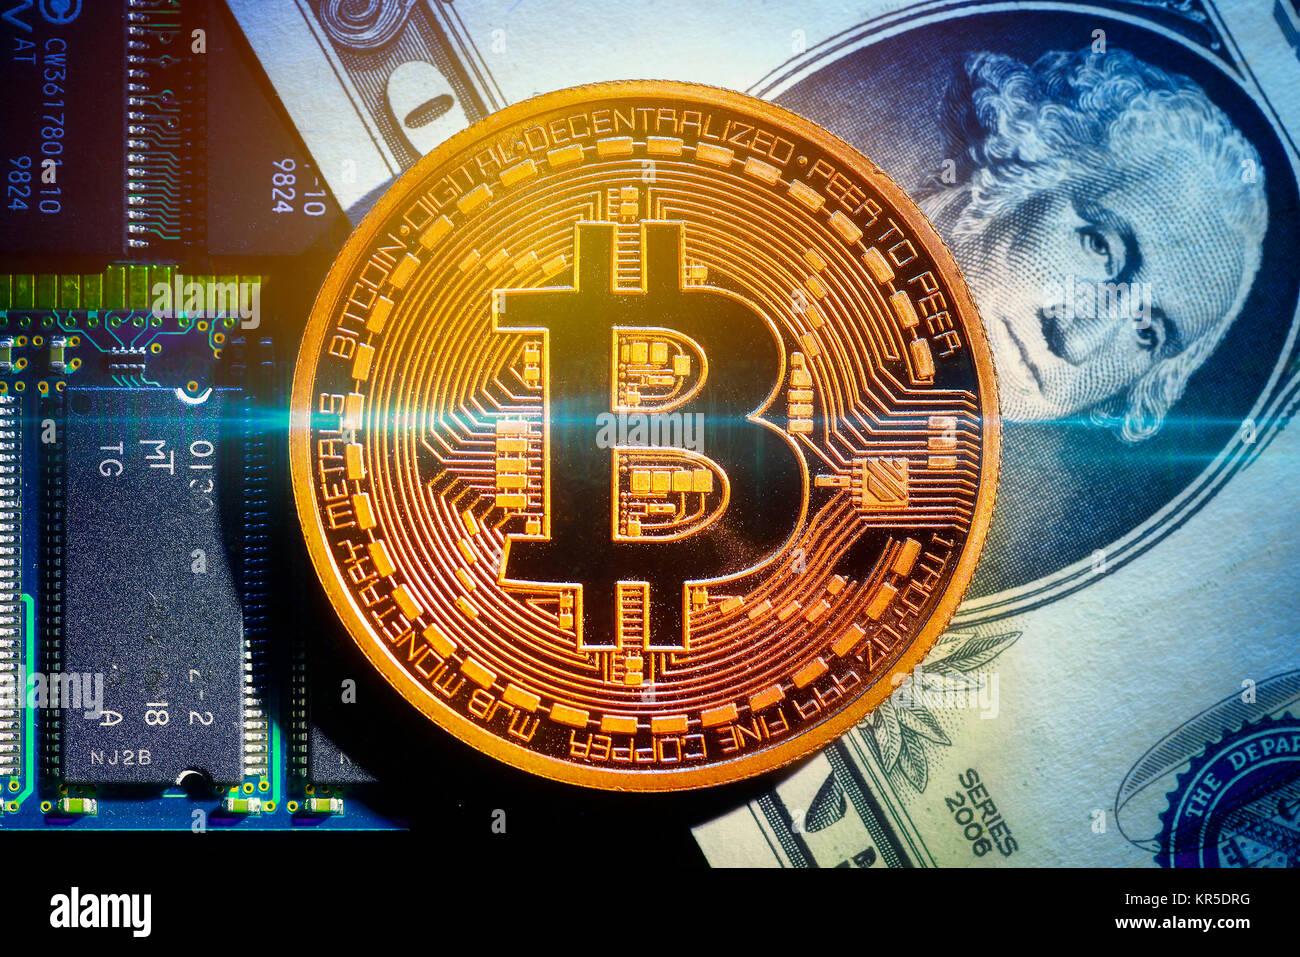 Coin with Bitcoin sign and dollar mark, Münze mit Bitcoin-Zeichen und Dollarnote Stock Photo